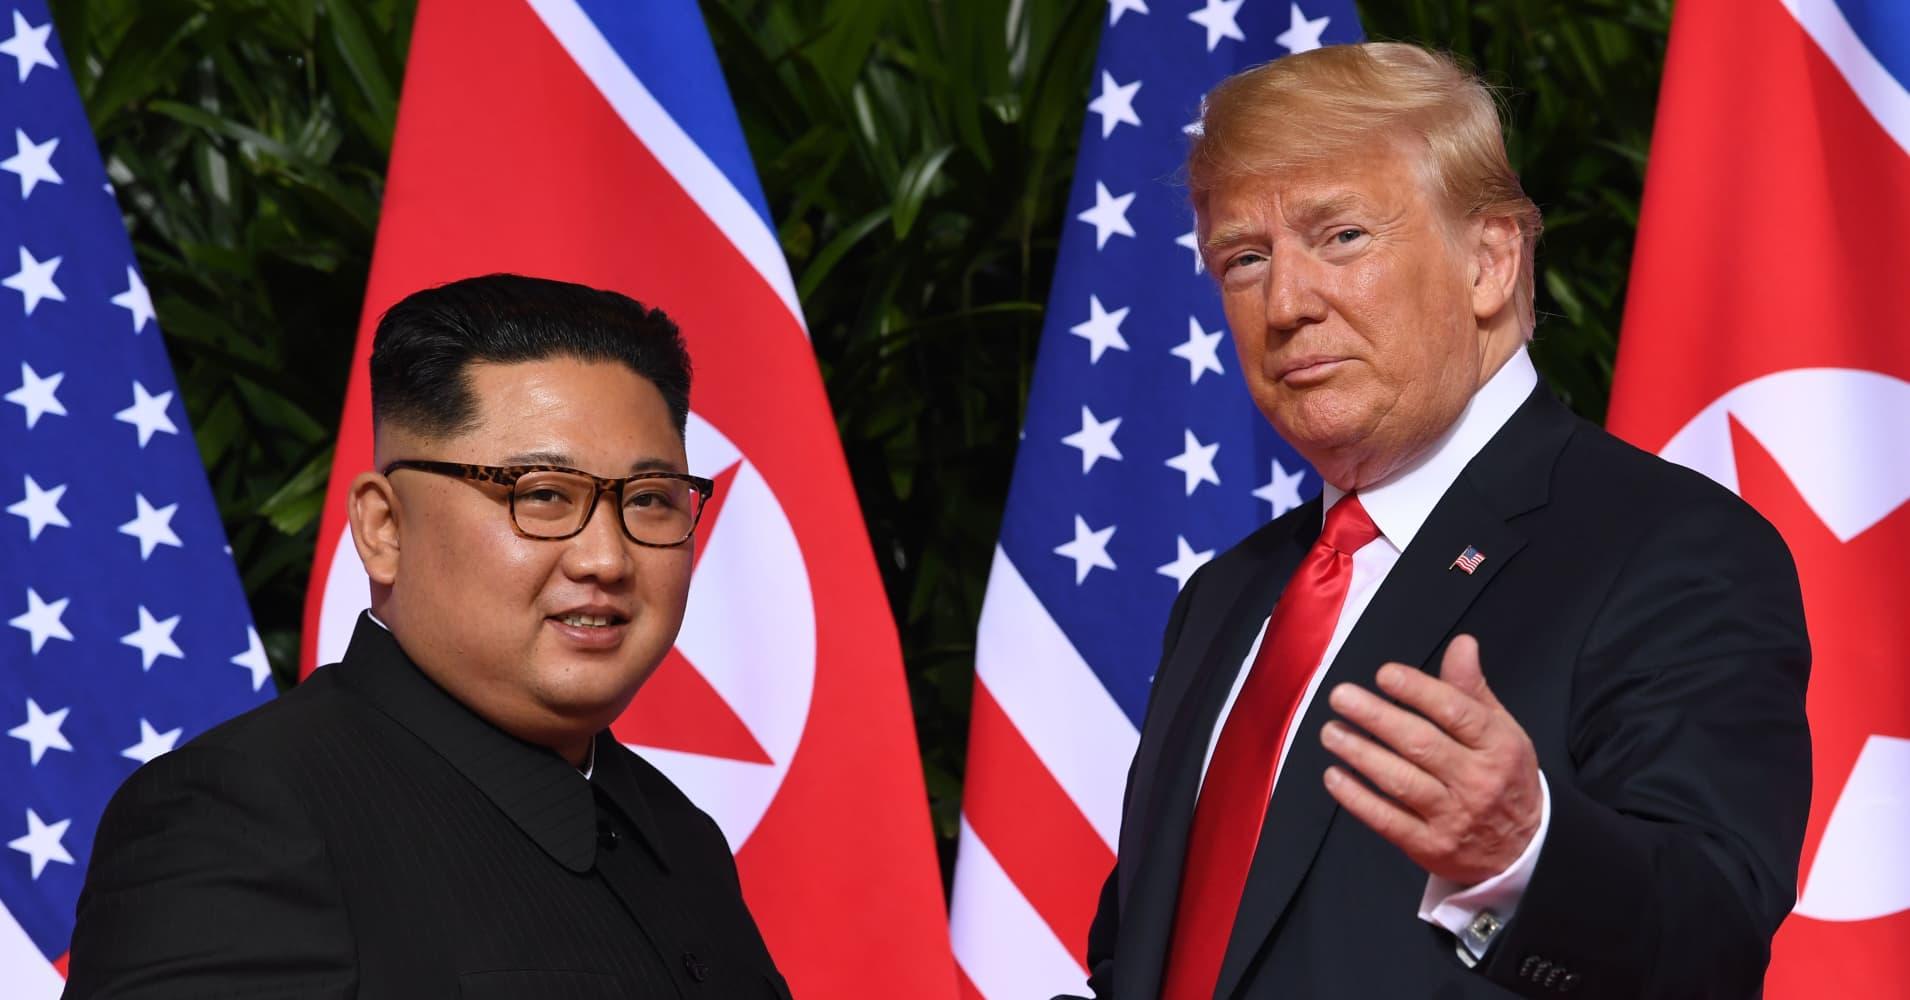 Trump reportedly plans to meet North Korea's Kim Jong Un in Vietnam this month